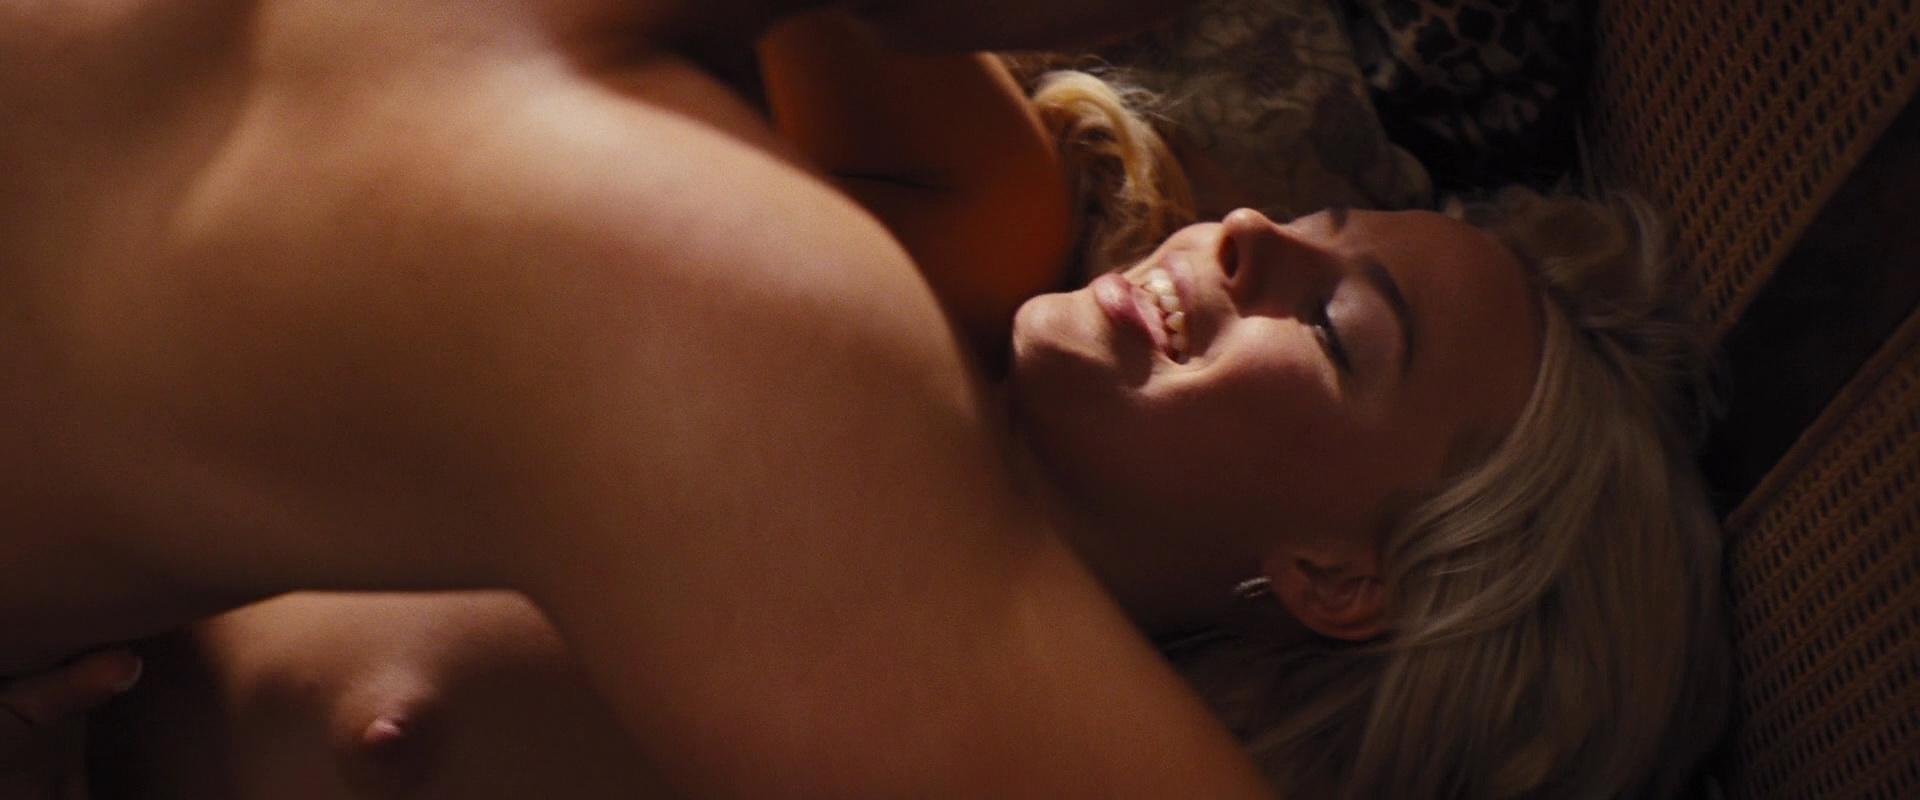 Margot Robbie follando